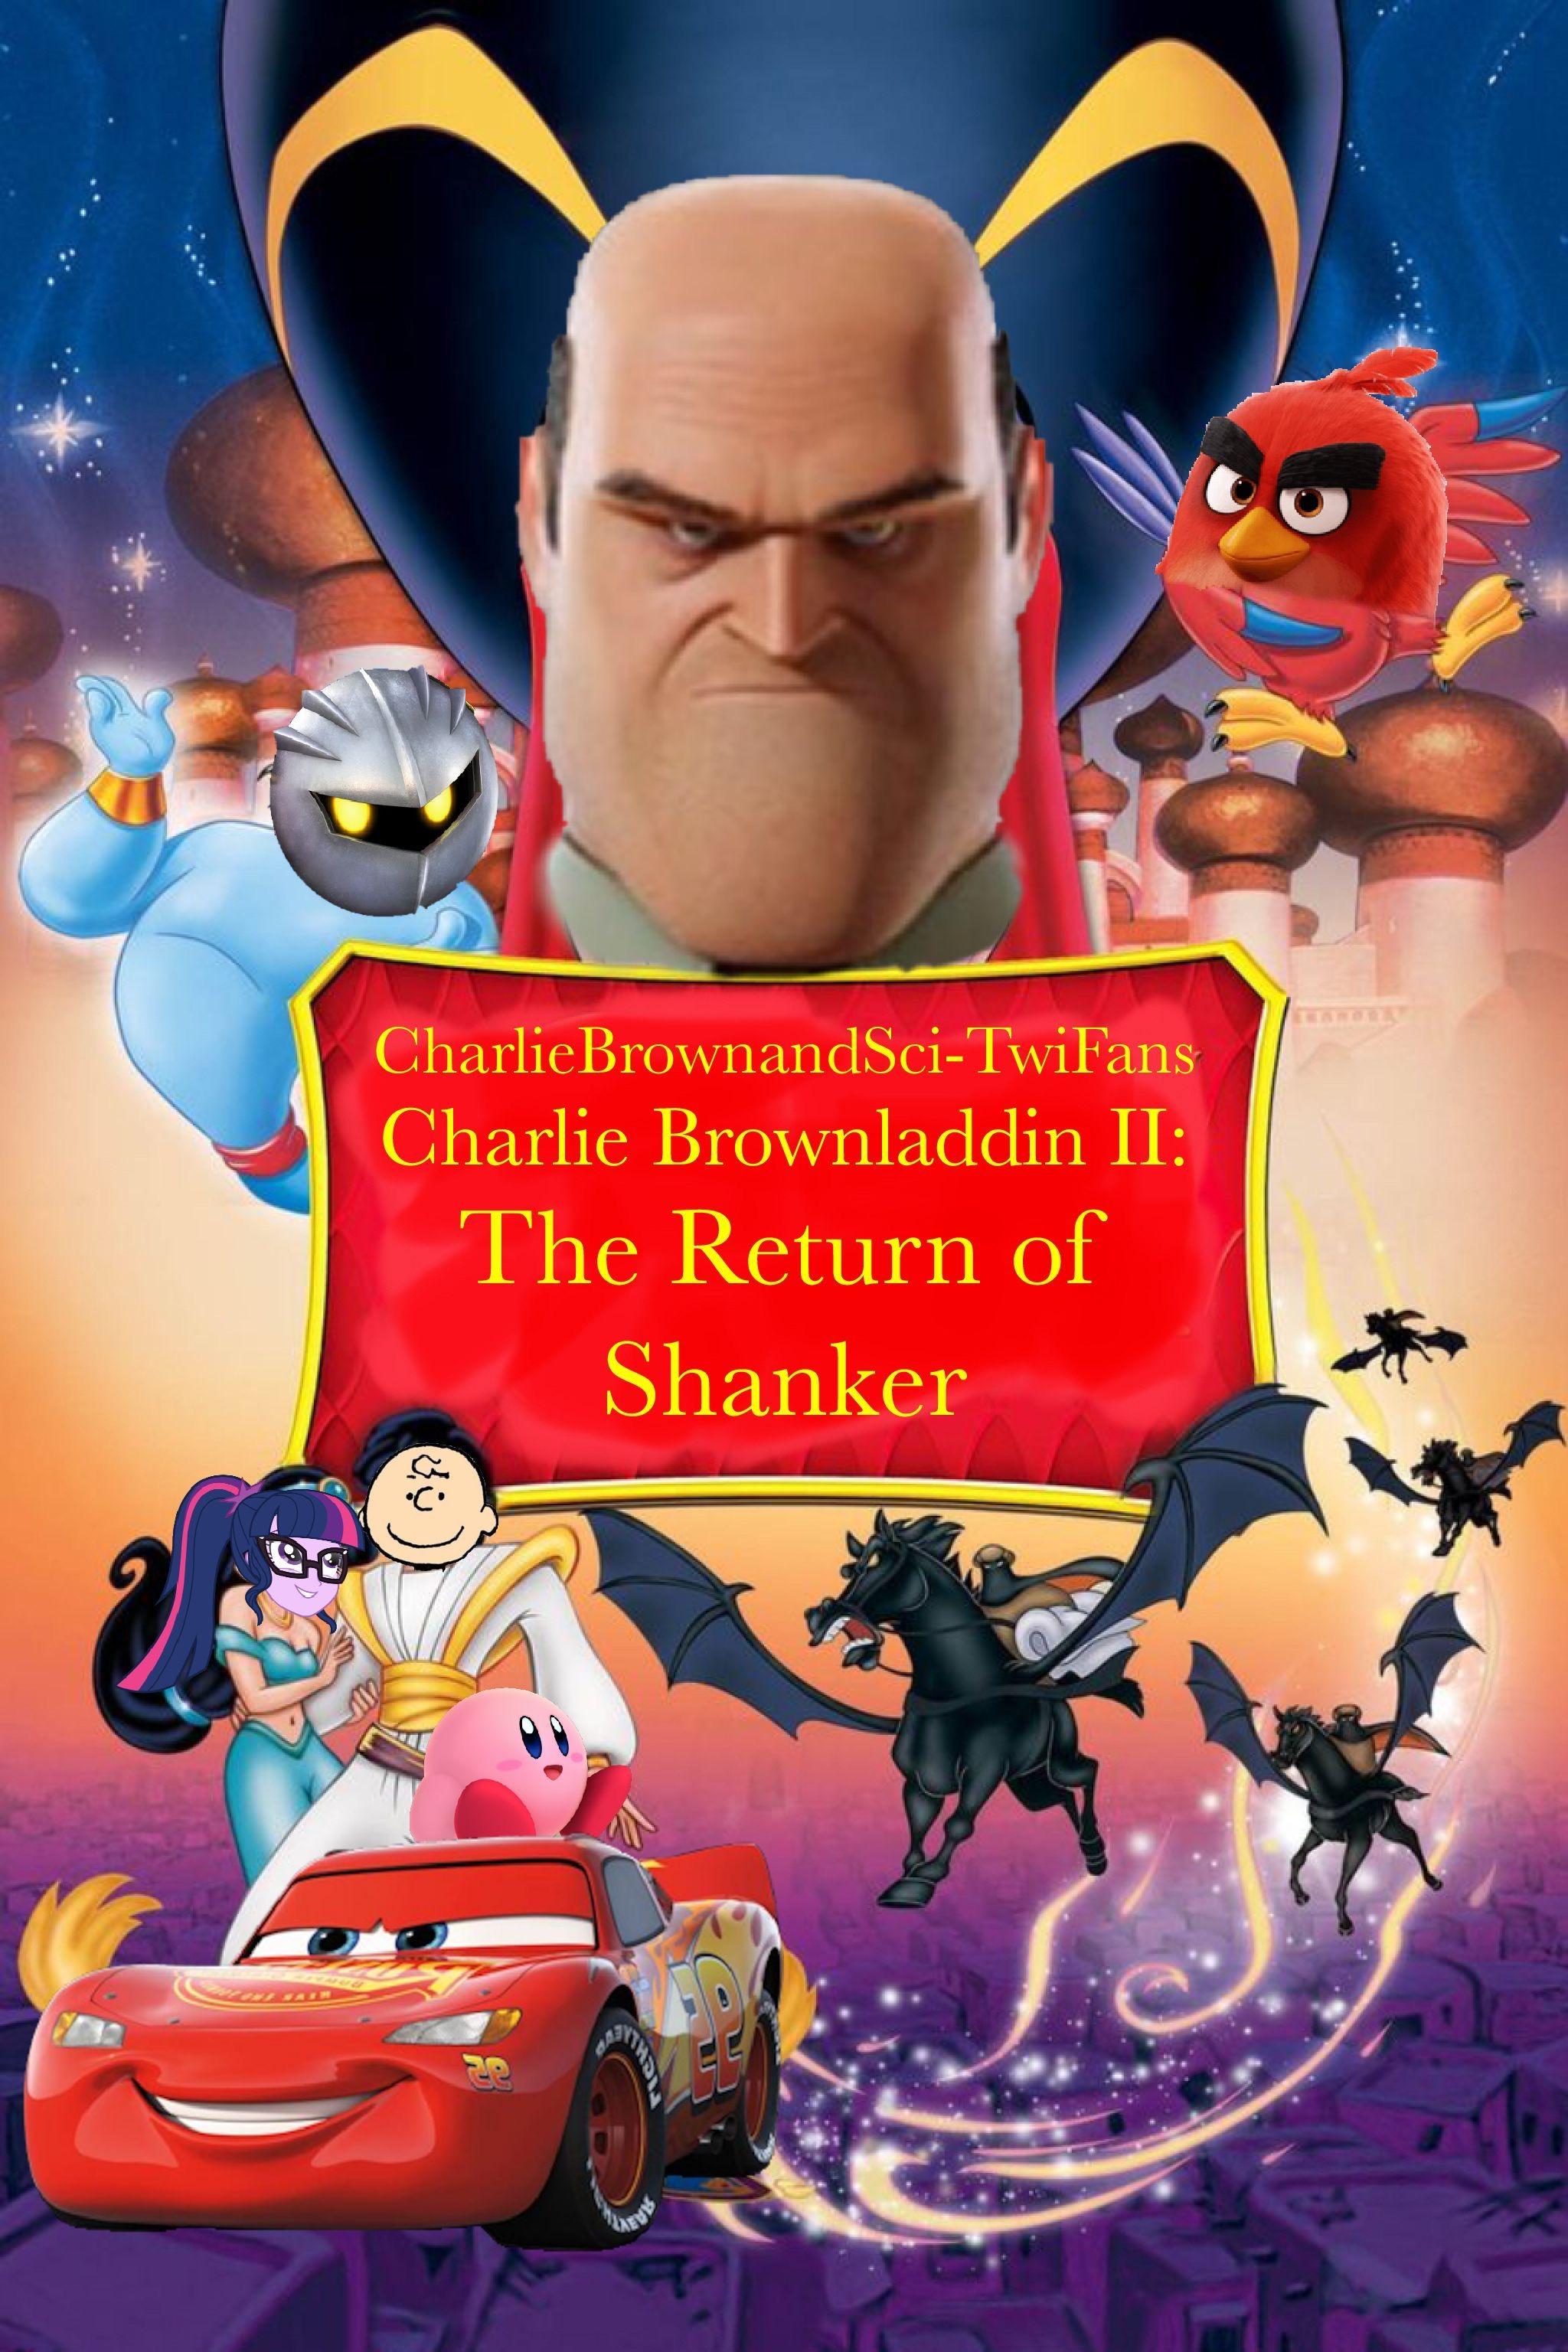 Charlie Brownladdin II: The Return of Shanker (CharlieBrownandSci-TwiFans Style)